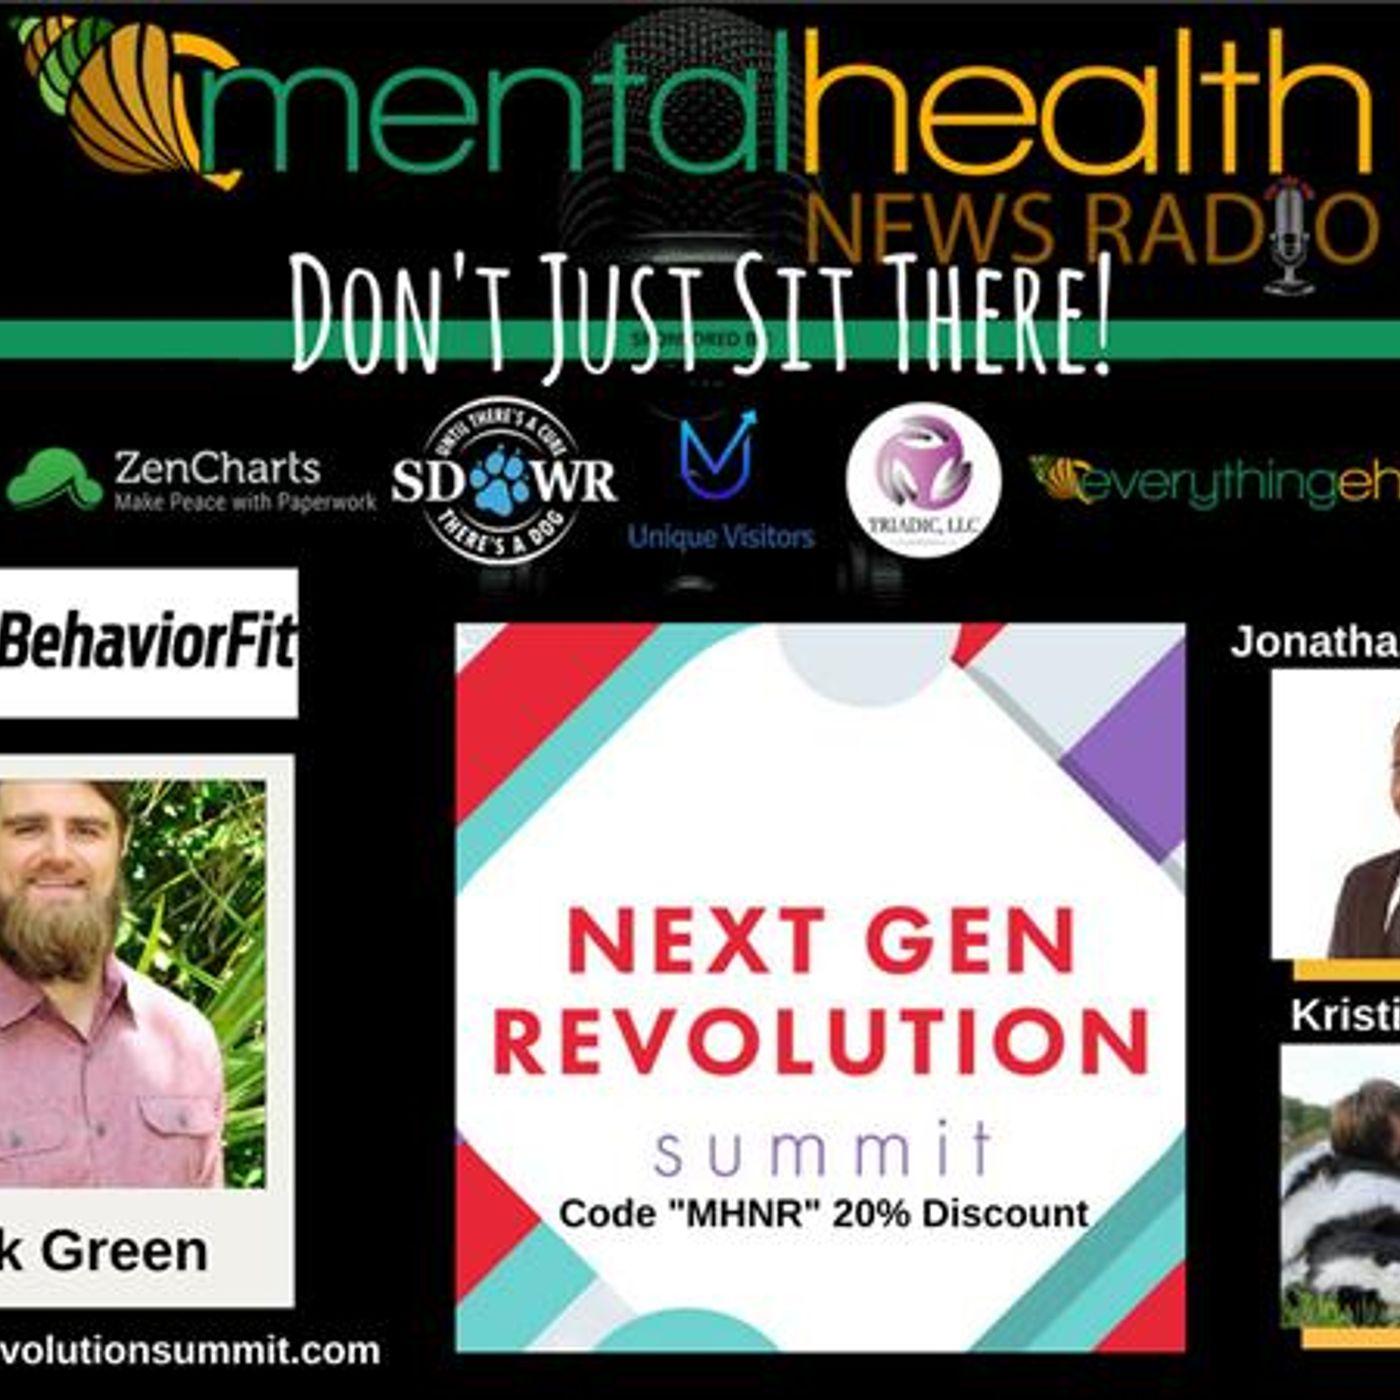 Mental Health News Radio - Don't Just Sit There! Nick Green at Next Gen Revolution Summit